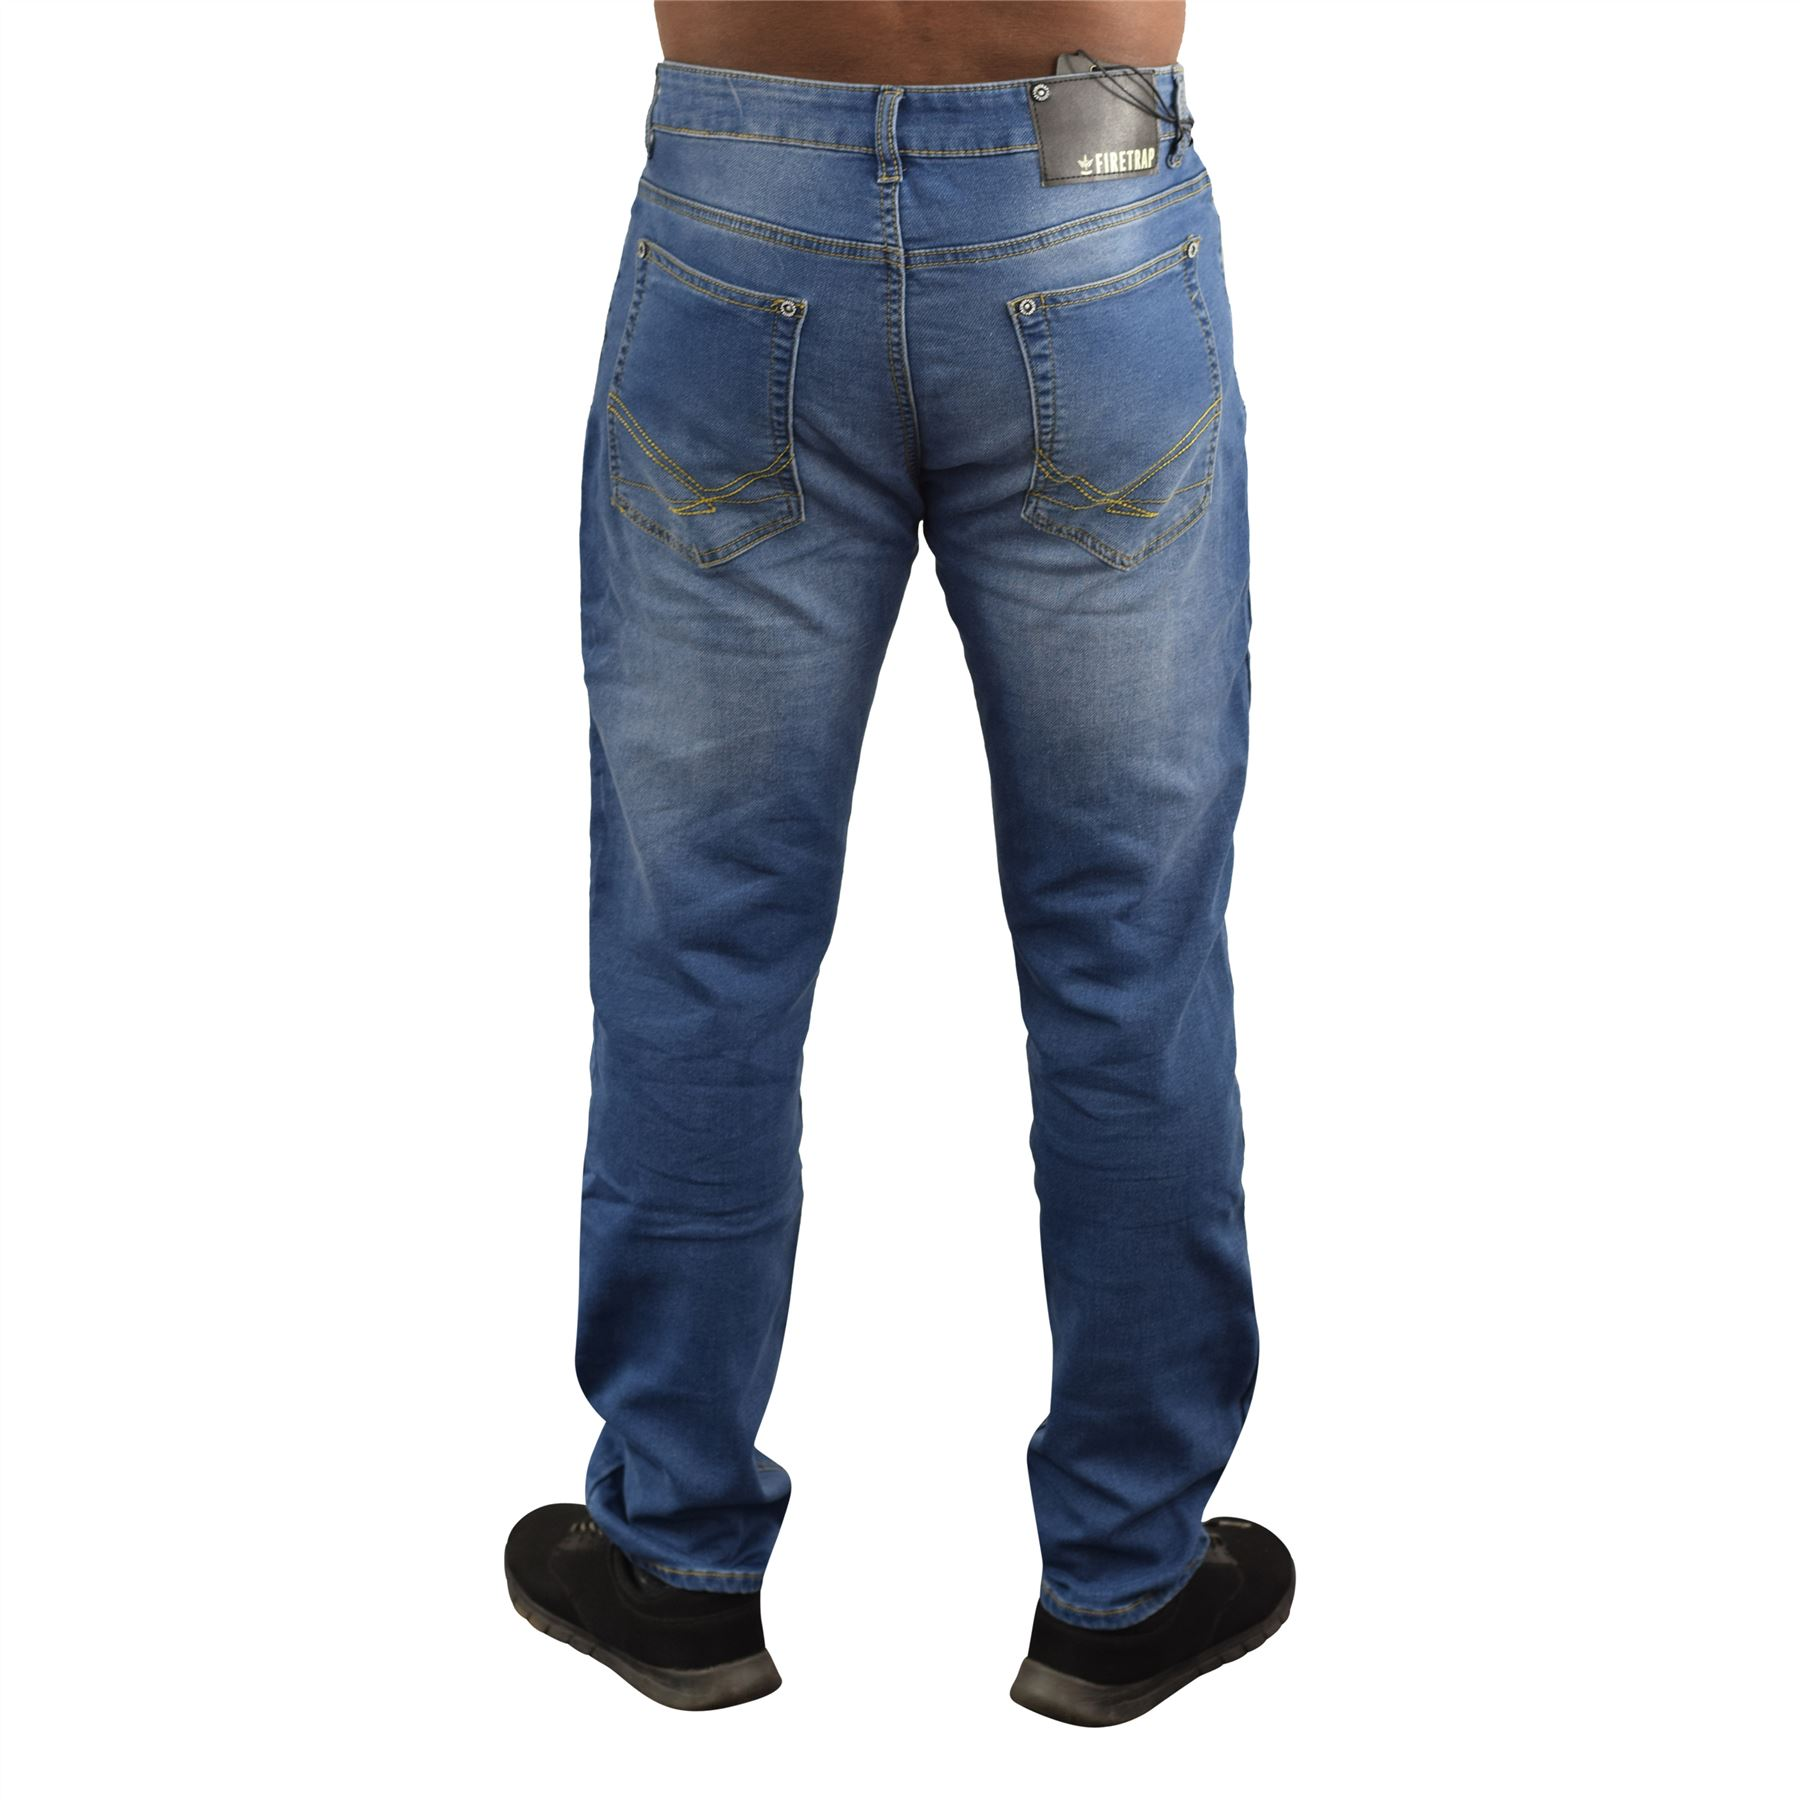 Mens-Jeans-Firetrap-Stretch-Durable-Straight-Leg-Regular-Fit-Relaxed-Denim-Jeans thumbnail 3